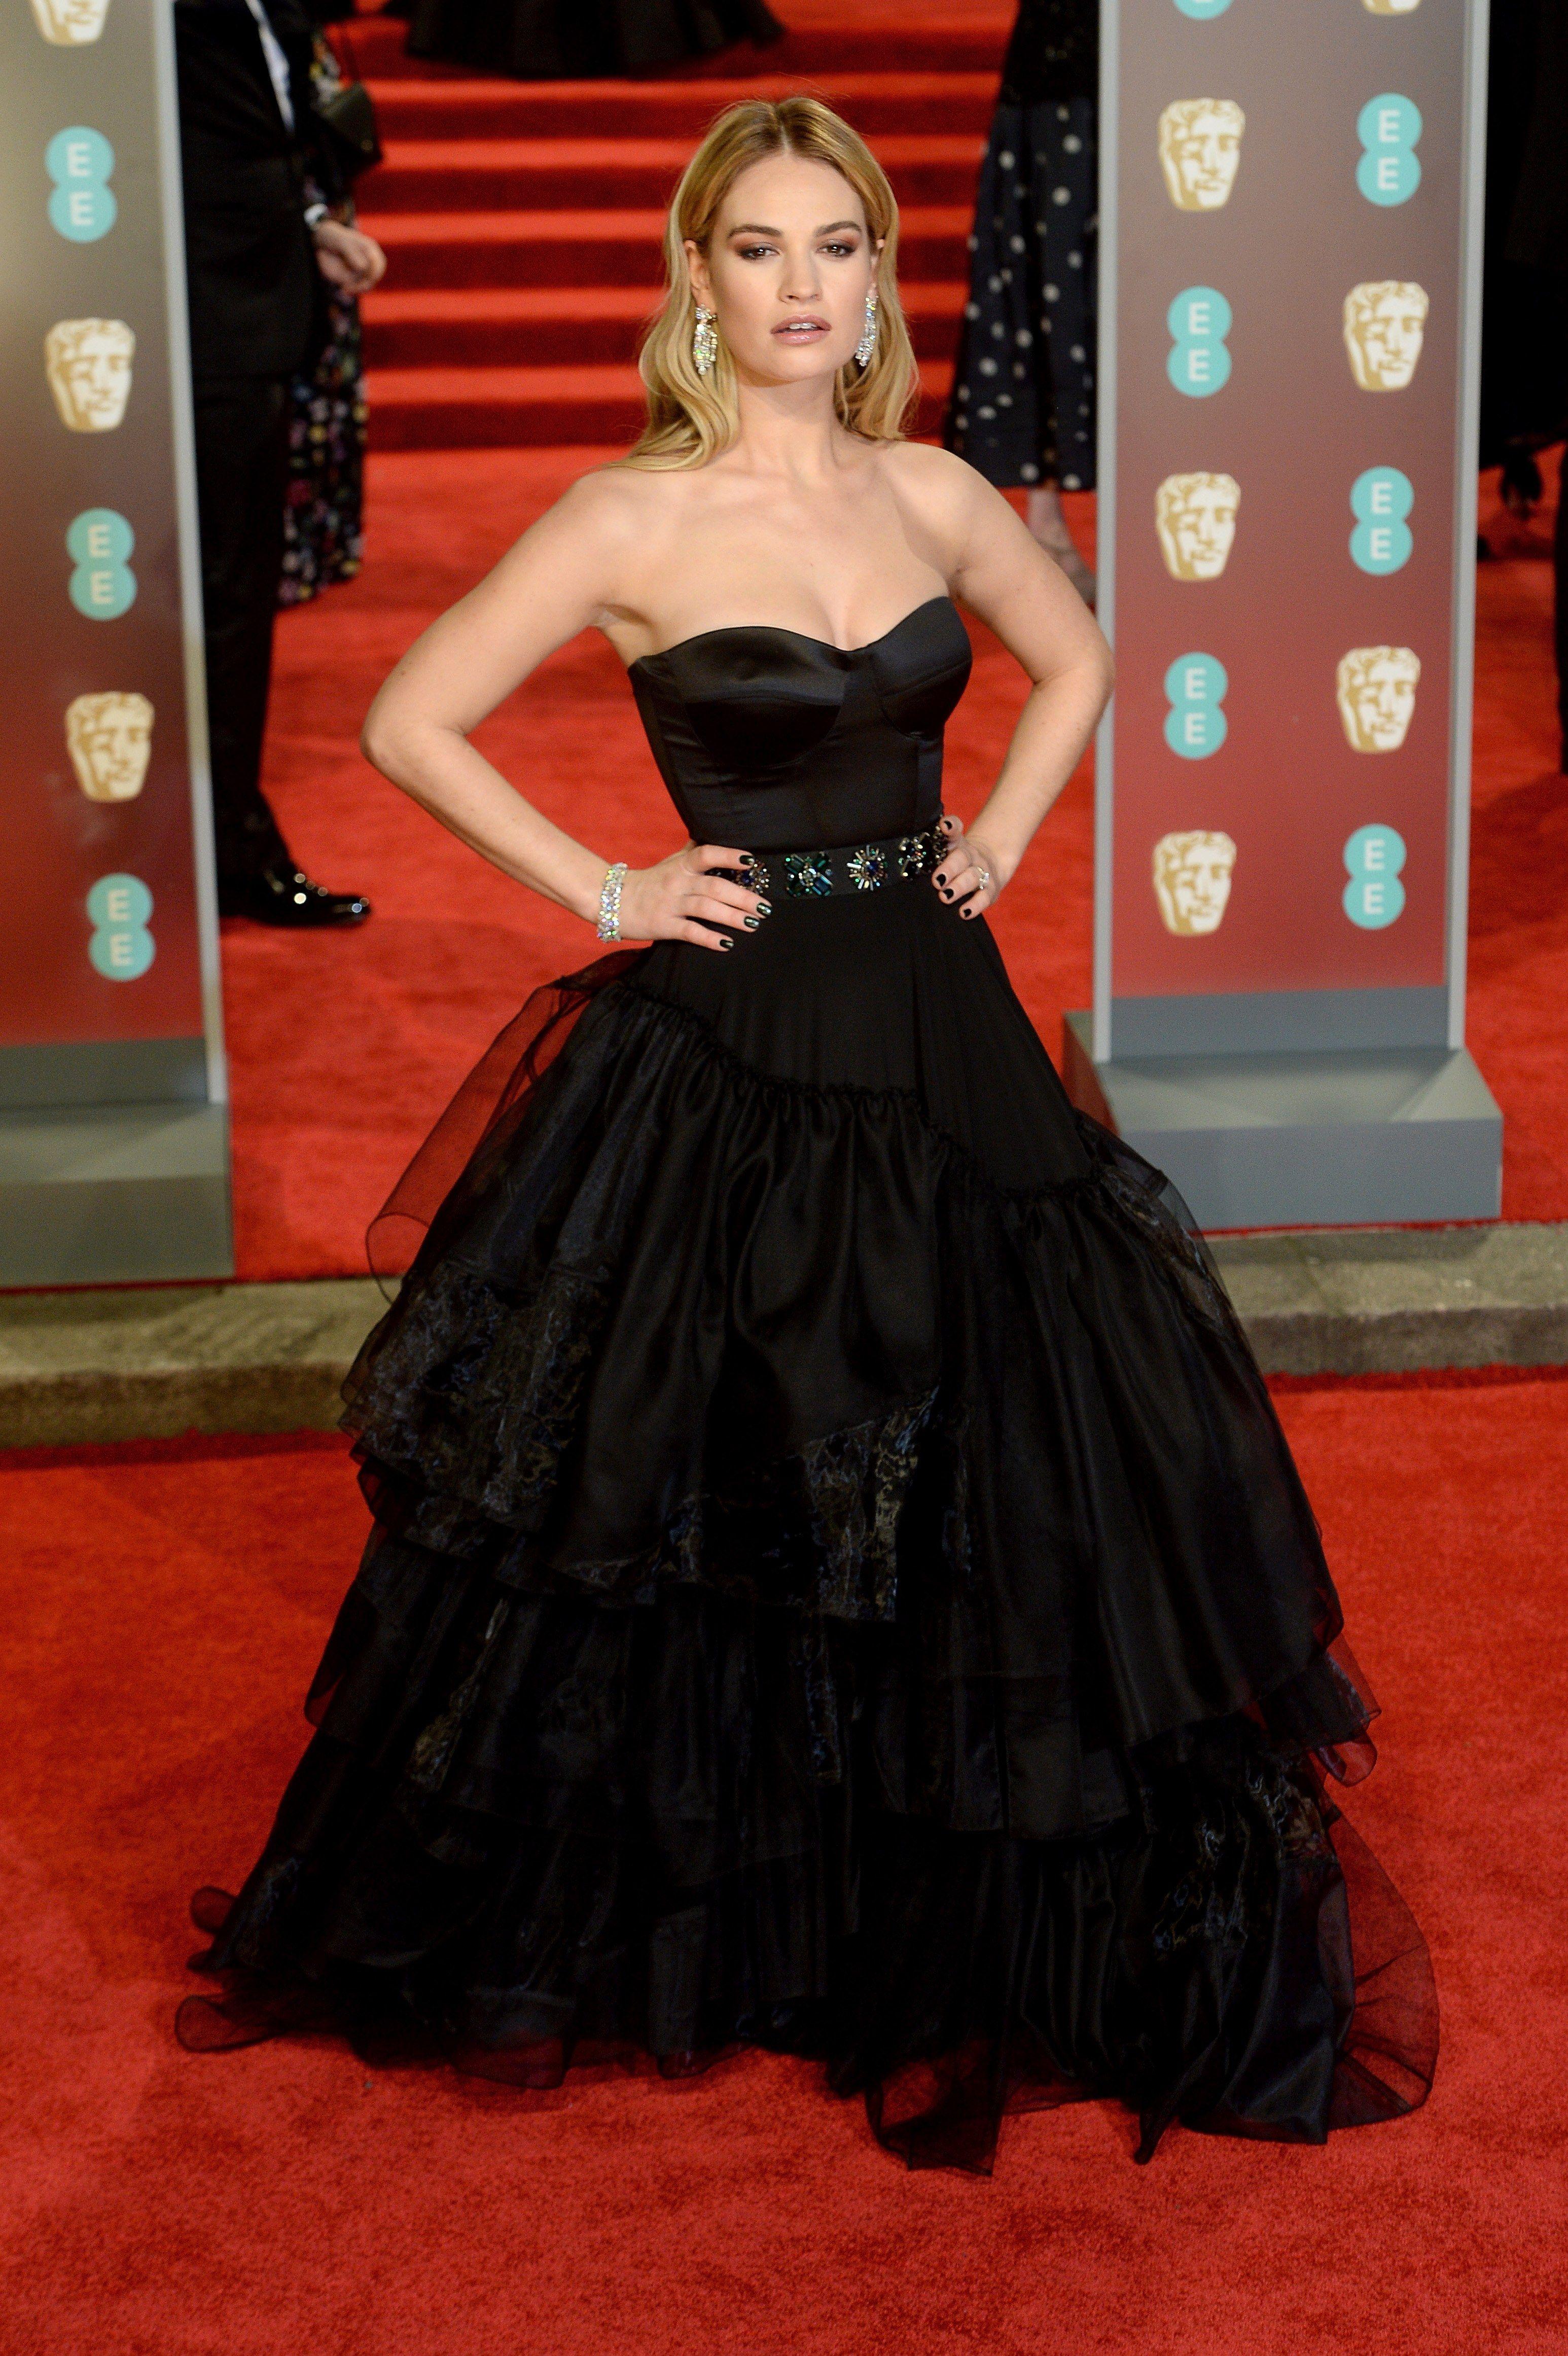 Bafta Red Carpet 2018 See Jennifer Lawrence Angelina Jolie And More Actresses In Black Dresses Black Dress Red